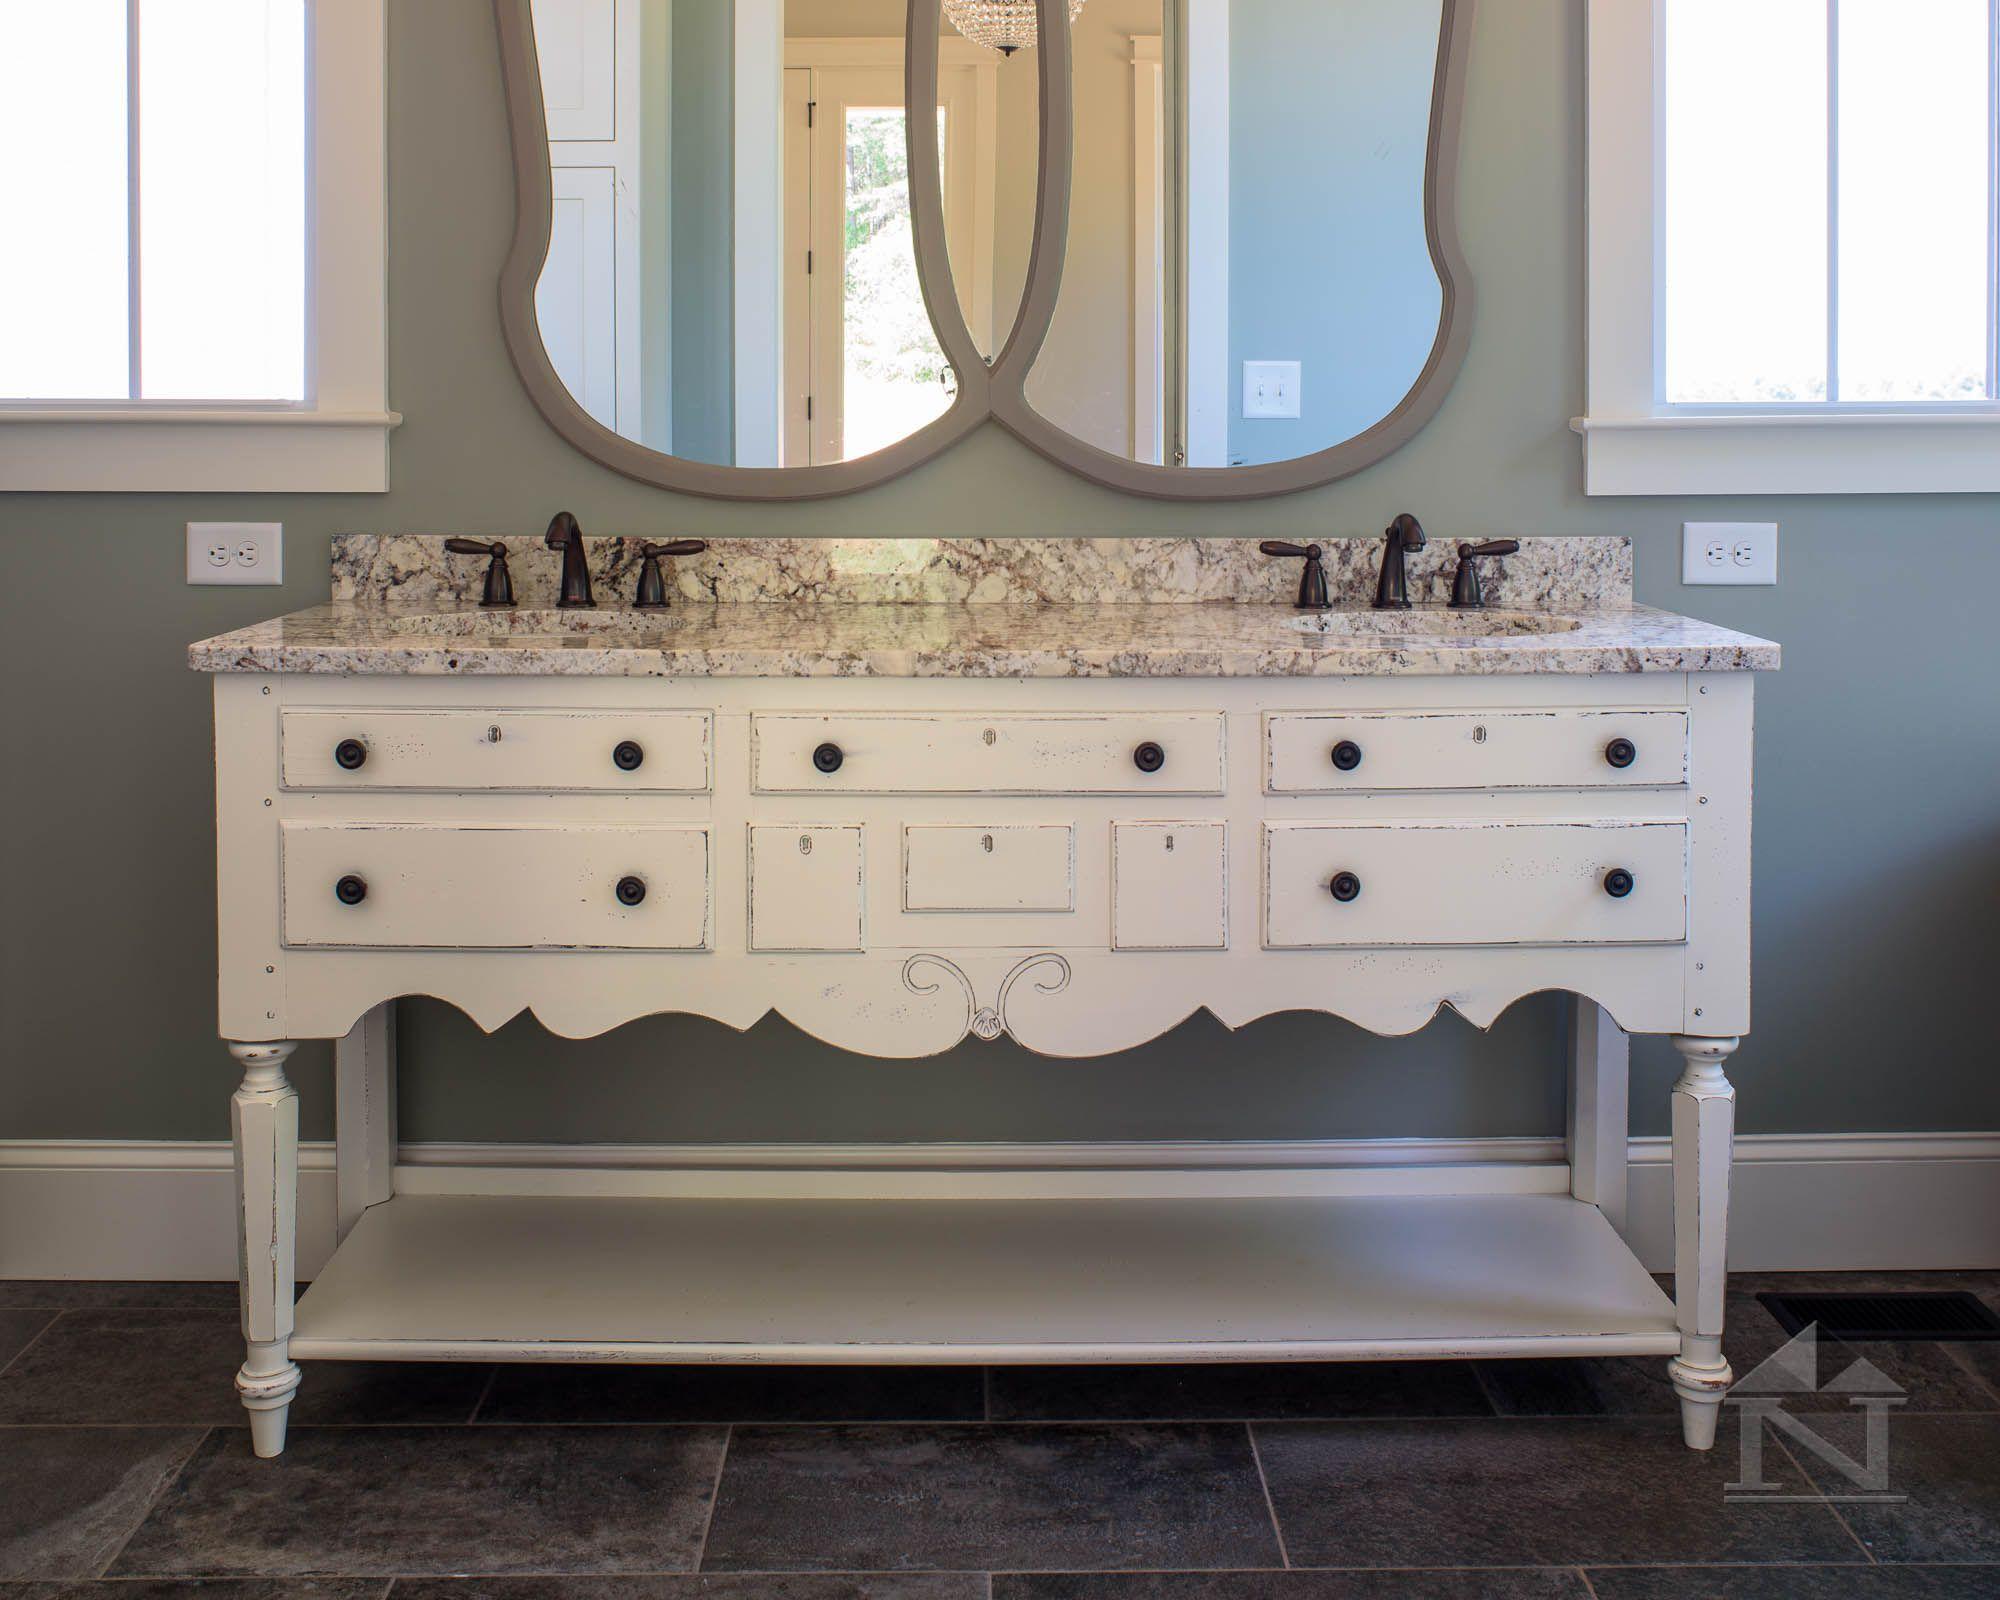 refurbished antique furniture piece to his her sink vanity four refurbished antique furniture piece to his her sink vanity four gables farmhouse floor plan